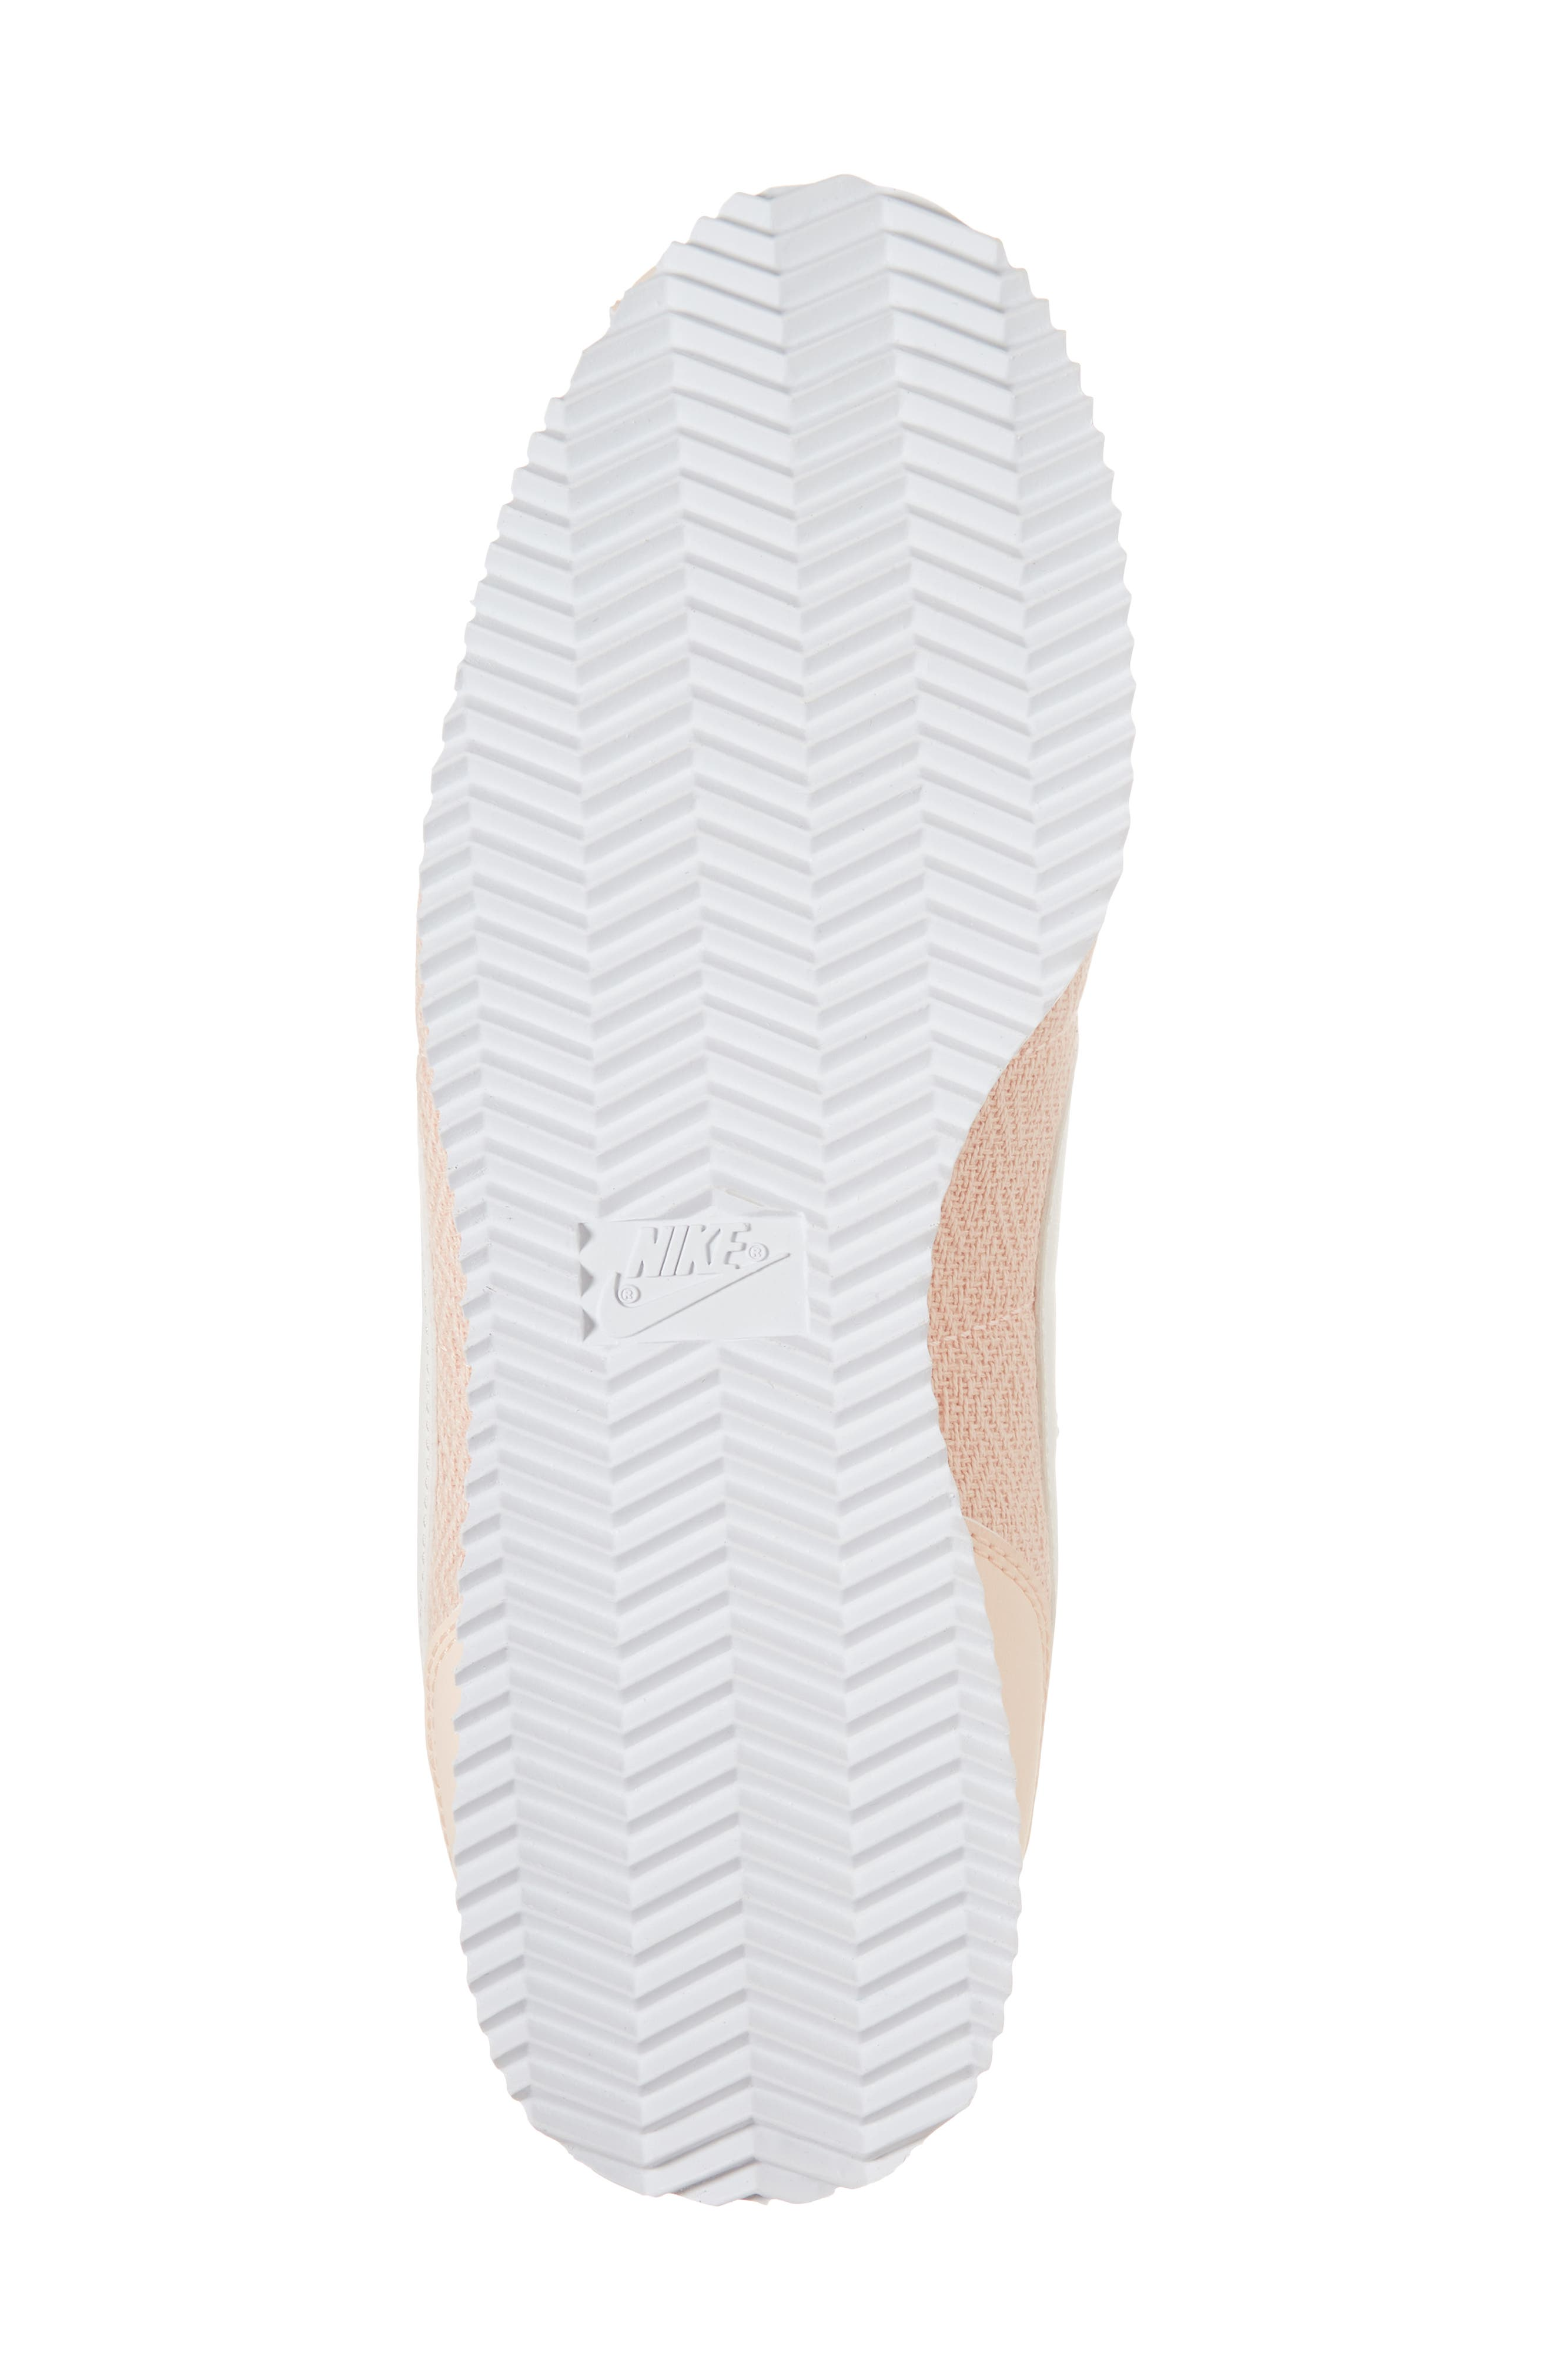 Cortez Basic TXT SE Sneaker,                             Alternate thumbnail 6, color,                             Crimson Tint/ Sail/ White